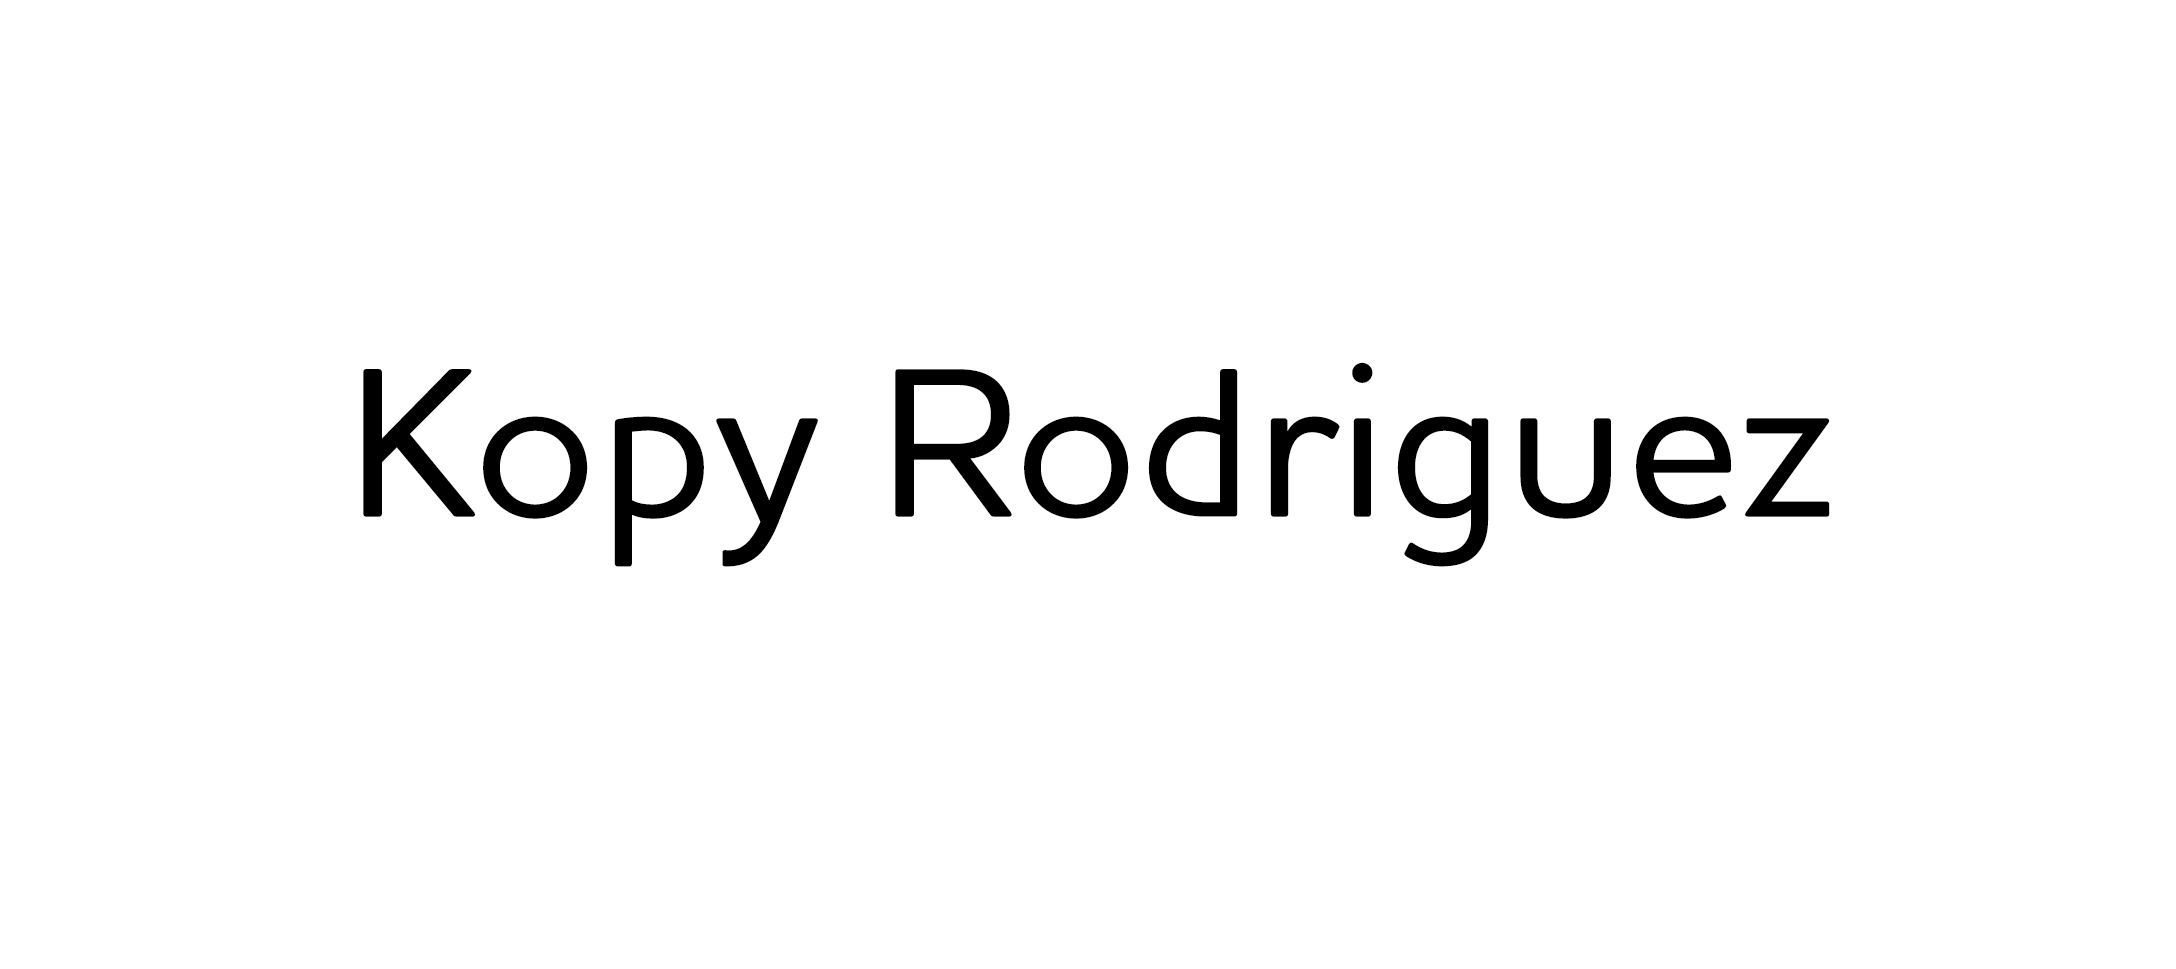 Kopy Rodriguez